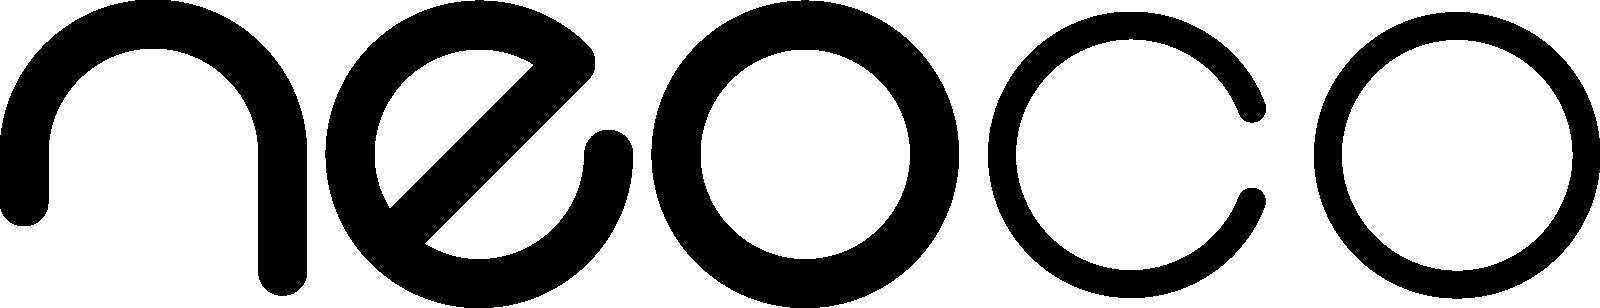 Neoco Logo